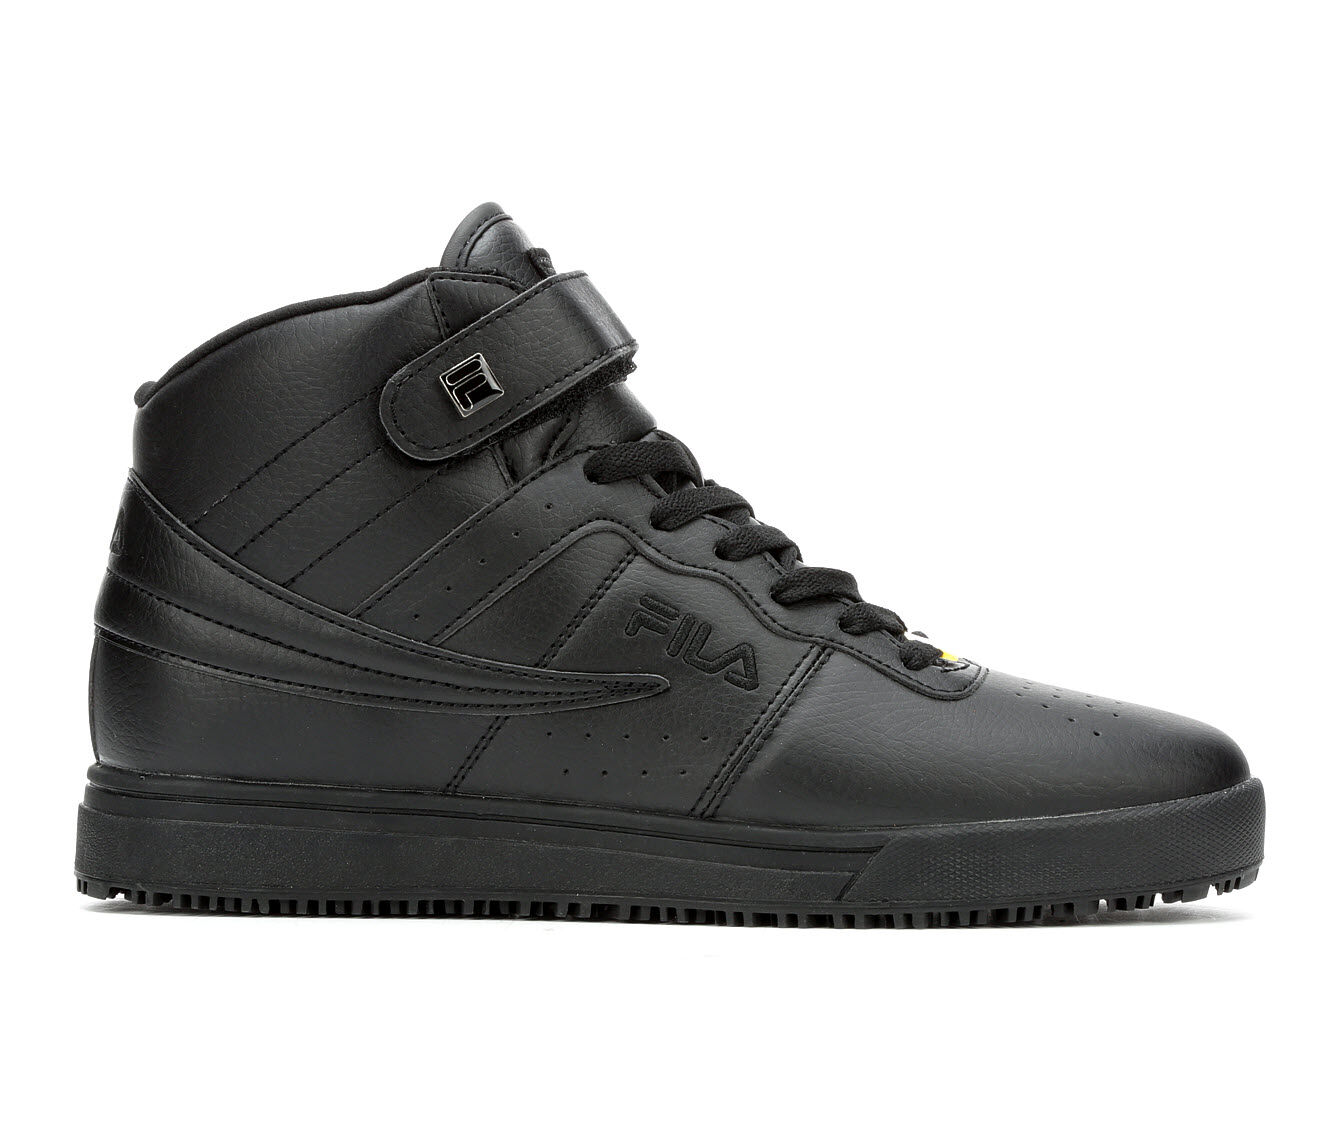 Men's Fila Vulc 13 Slip Resistant Safety Shoes Black/Black